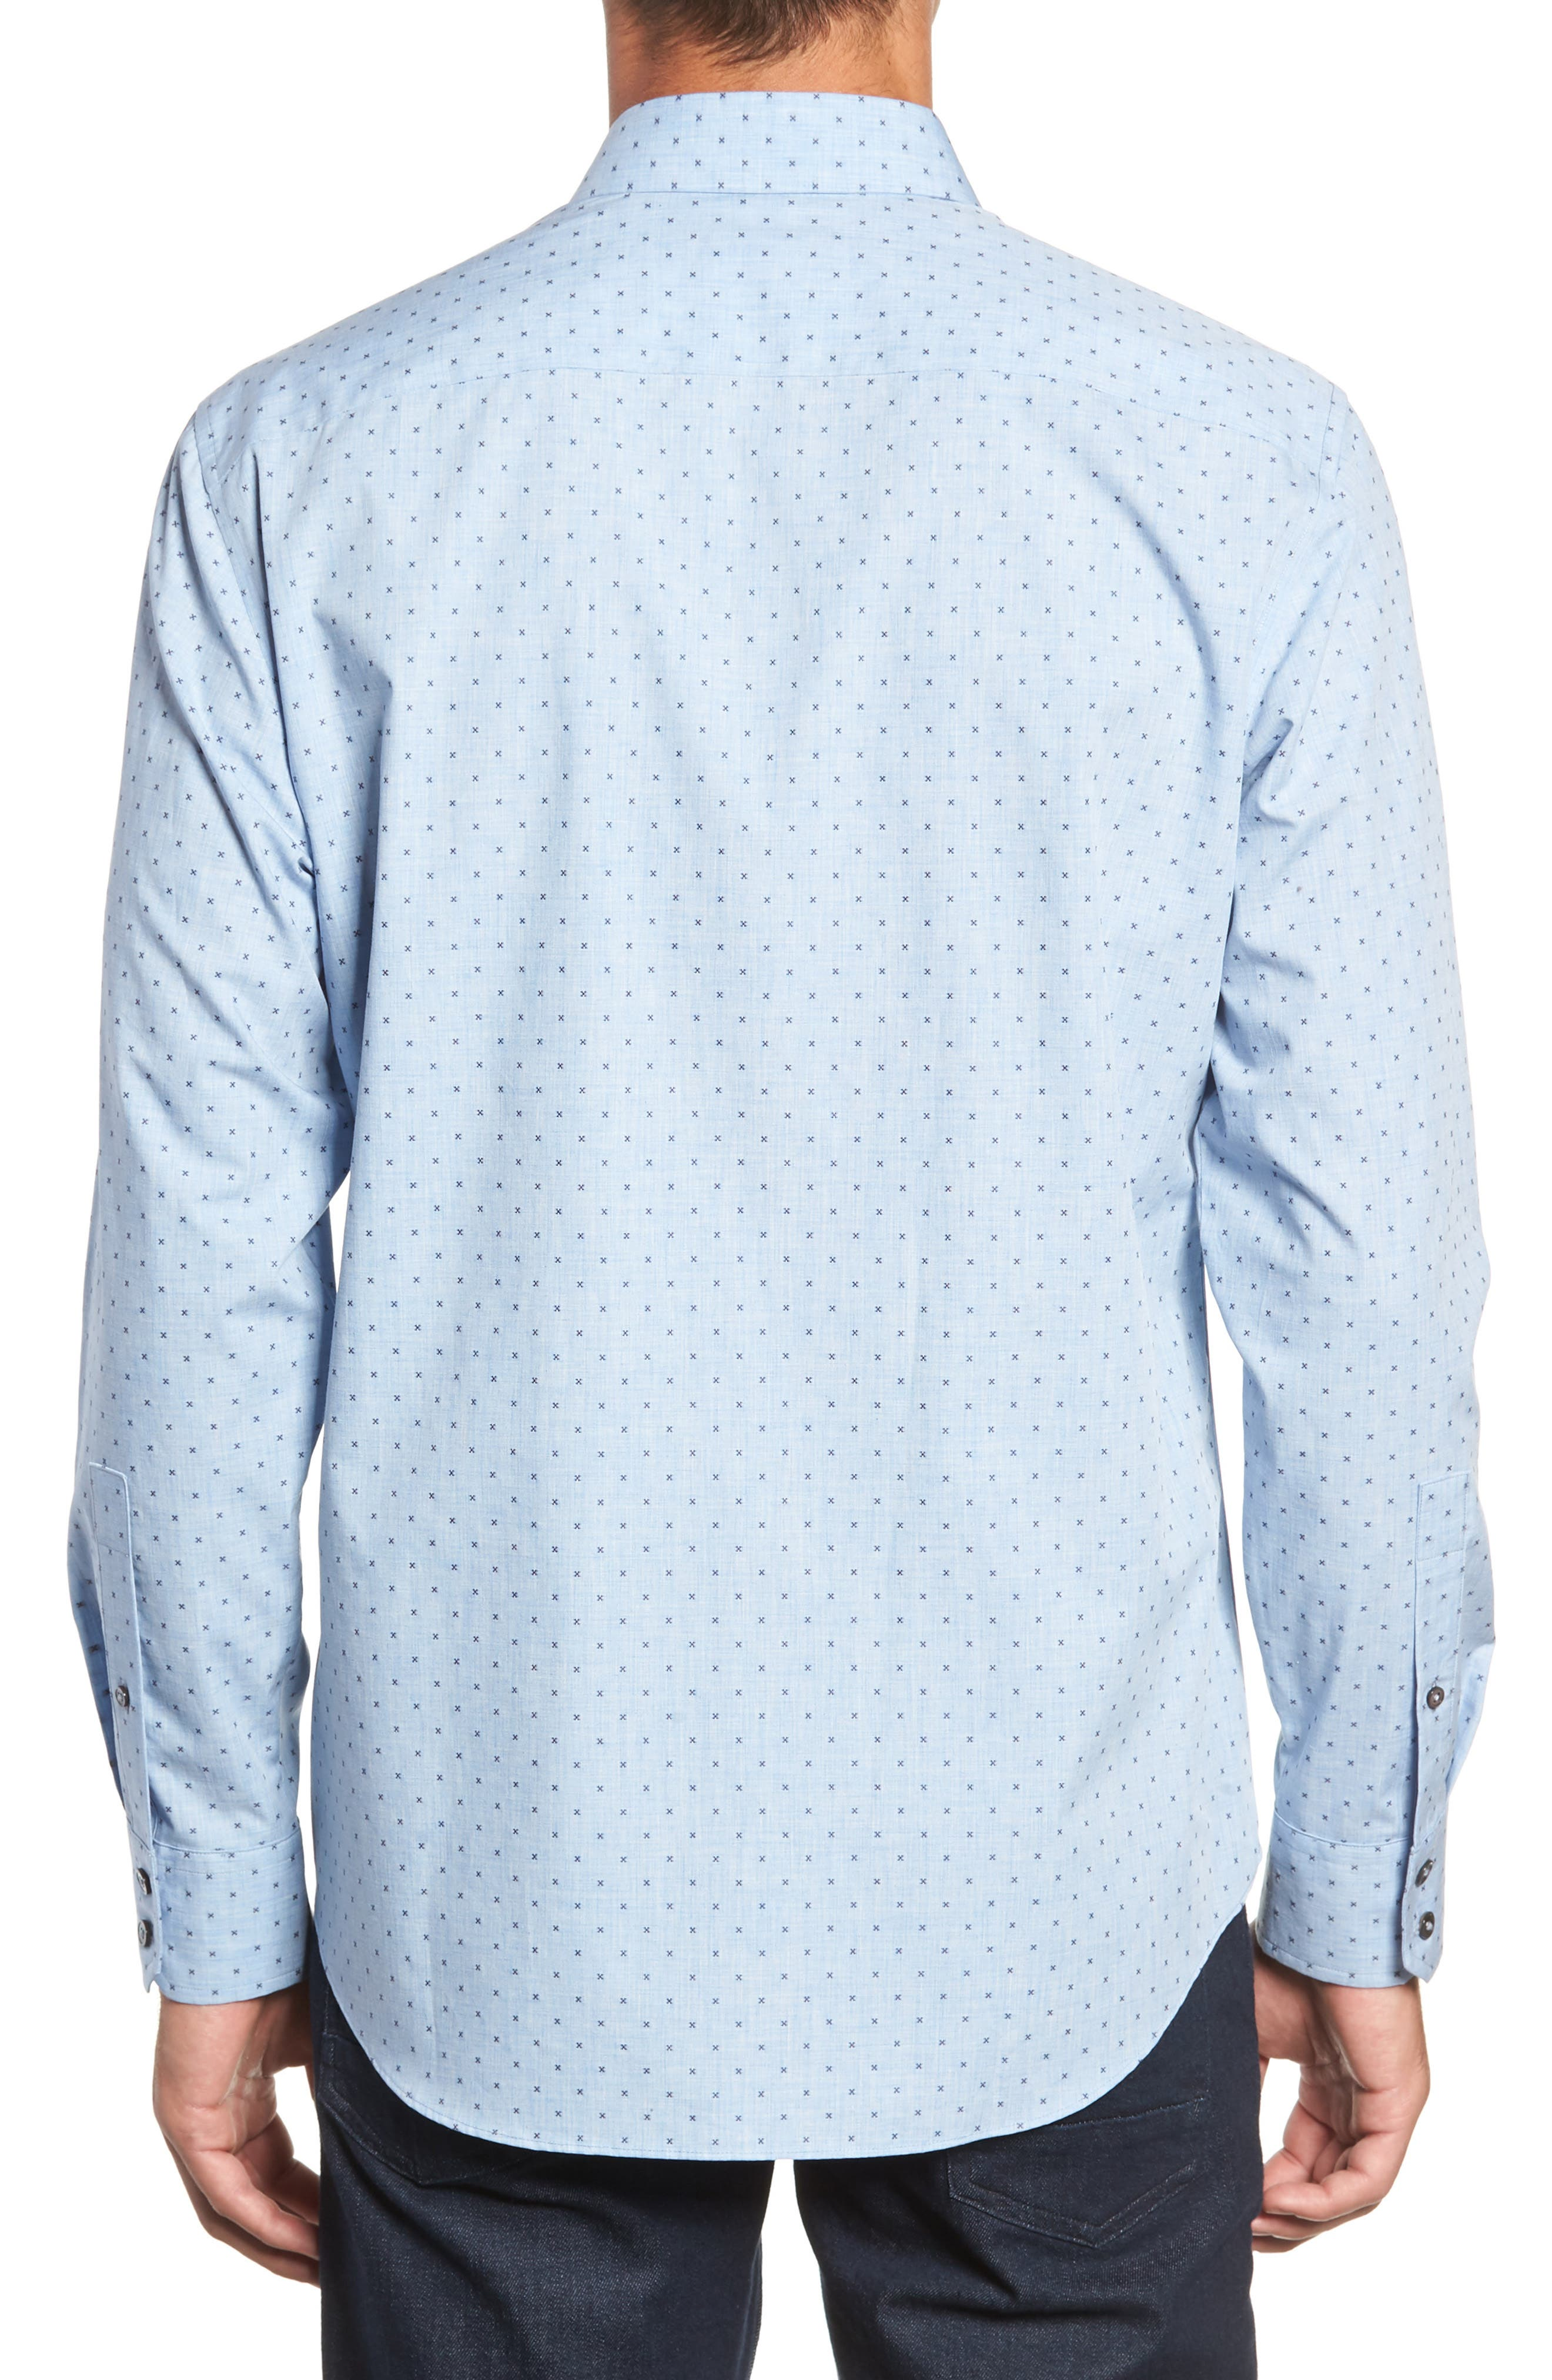 Zhang Regular Fit Sport Shirt,                             Alternate thumbnail 3, color,                             LIGHT BLUE